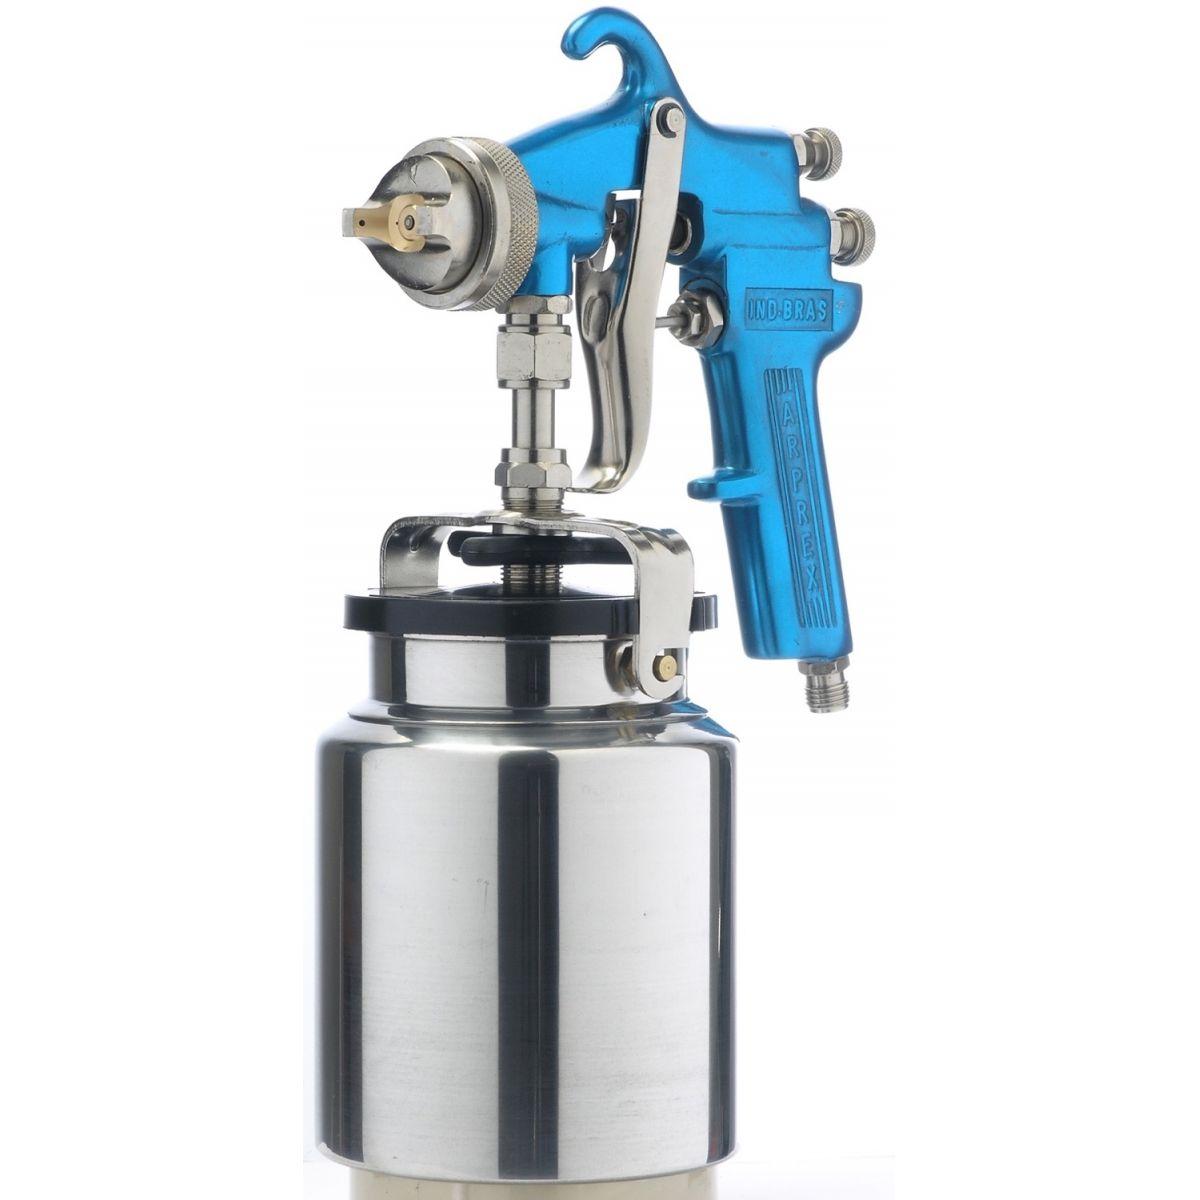 Pistola Pintura Arprex Alta Produção Modelo 1A